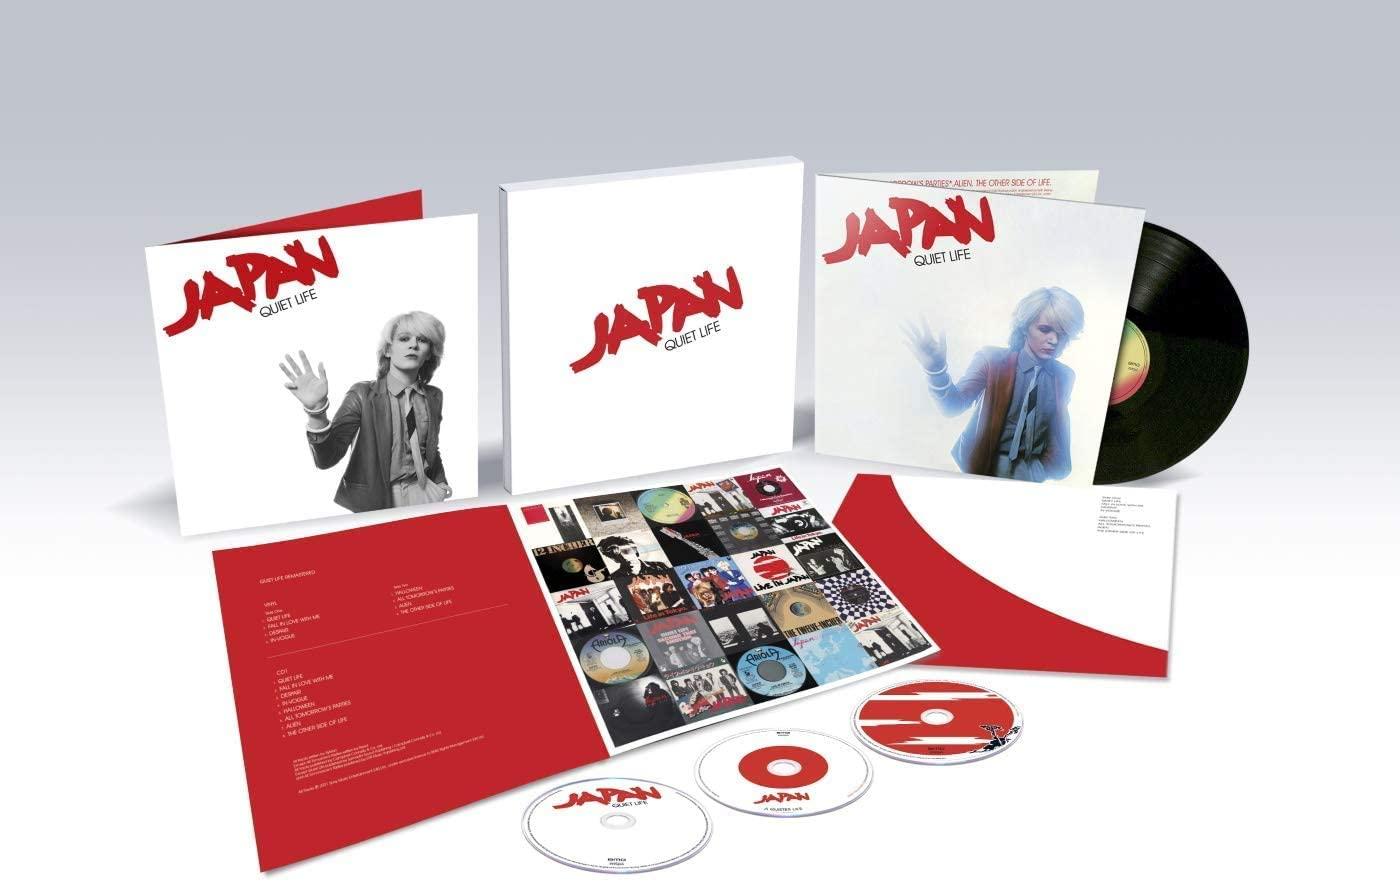 Quiet Life - Japan - Musik - BMG Rights Management LLC - 4050538625356 - March 5, 2021